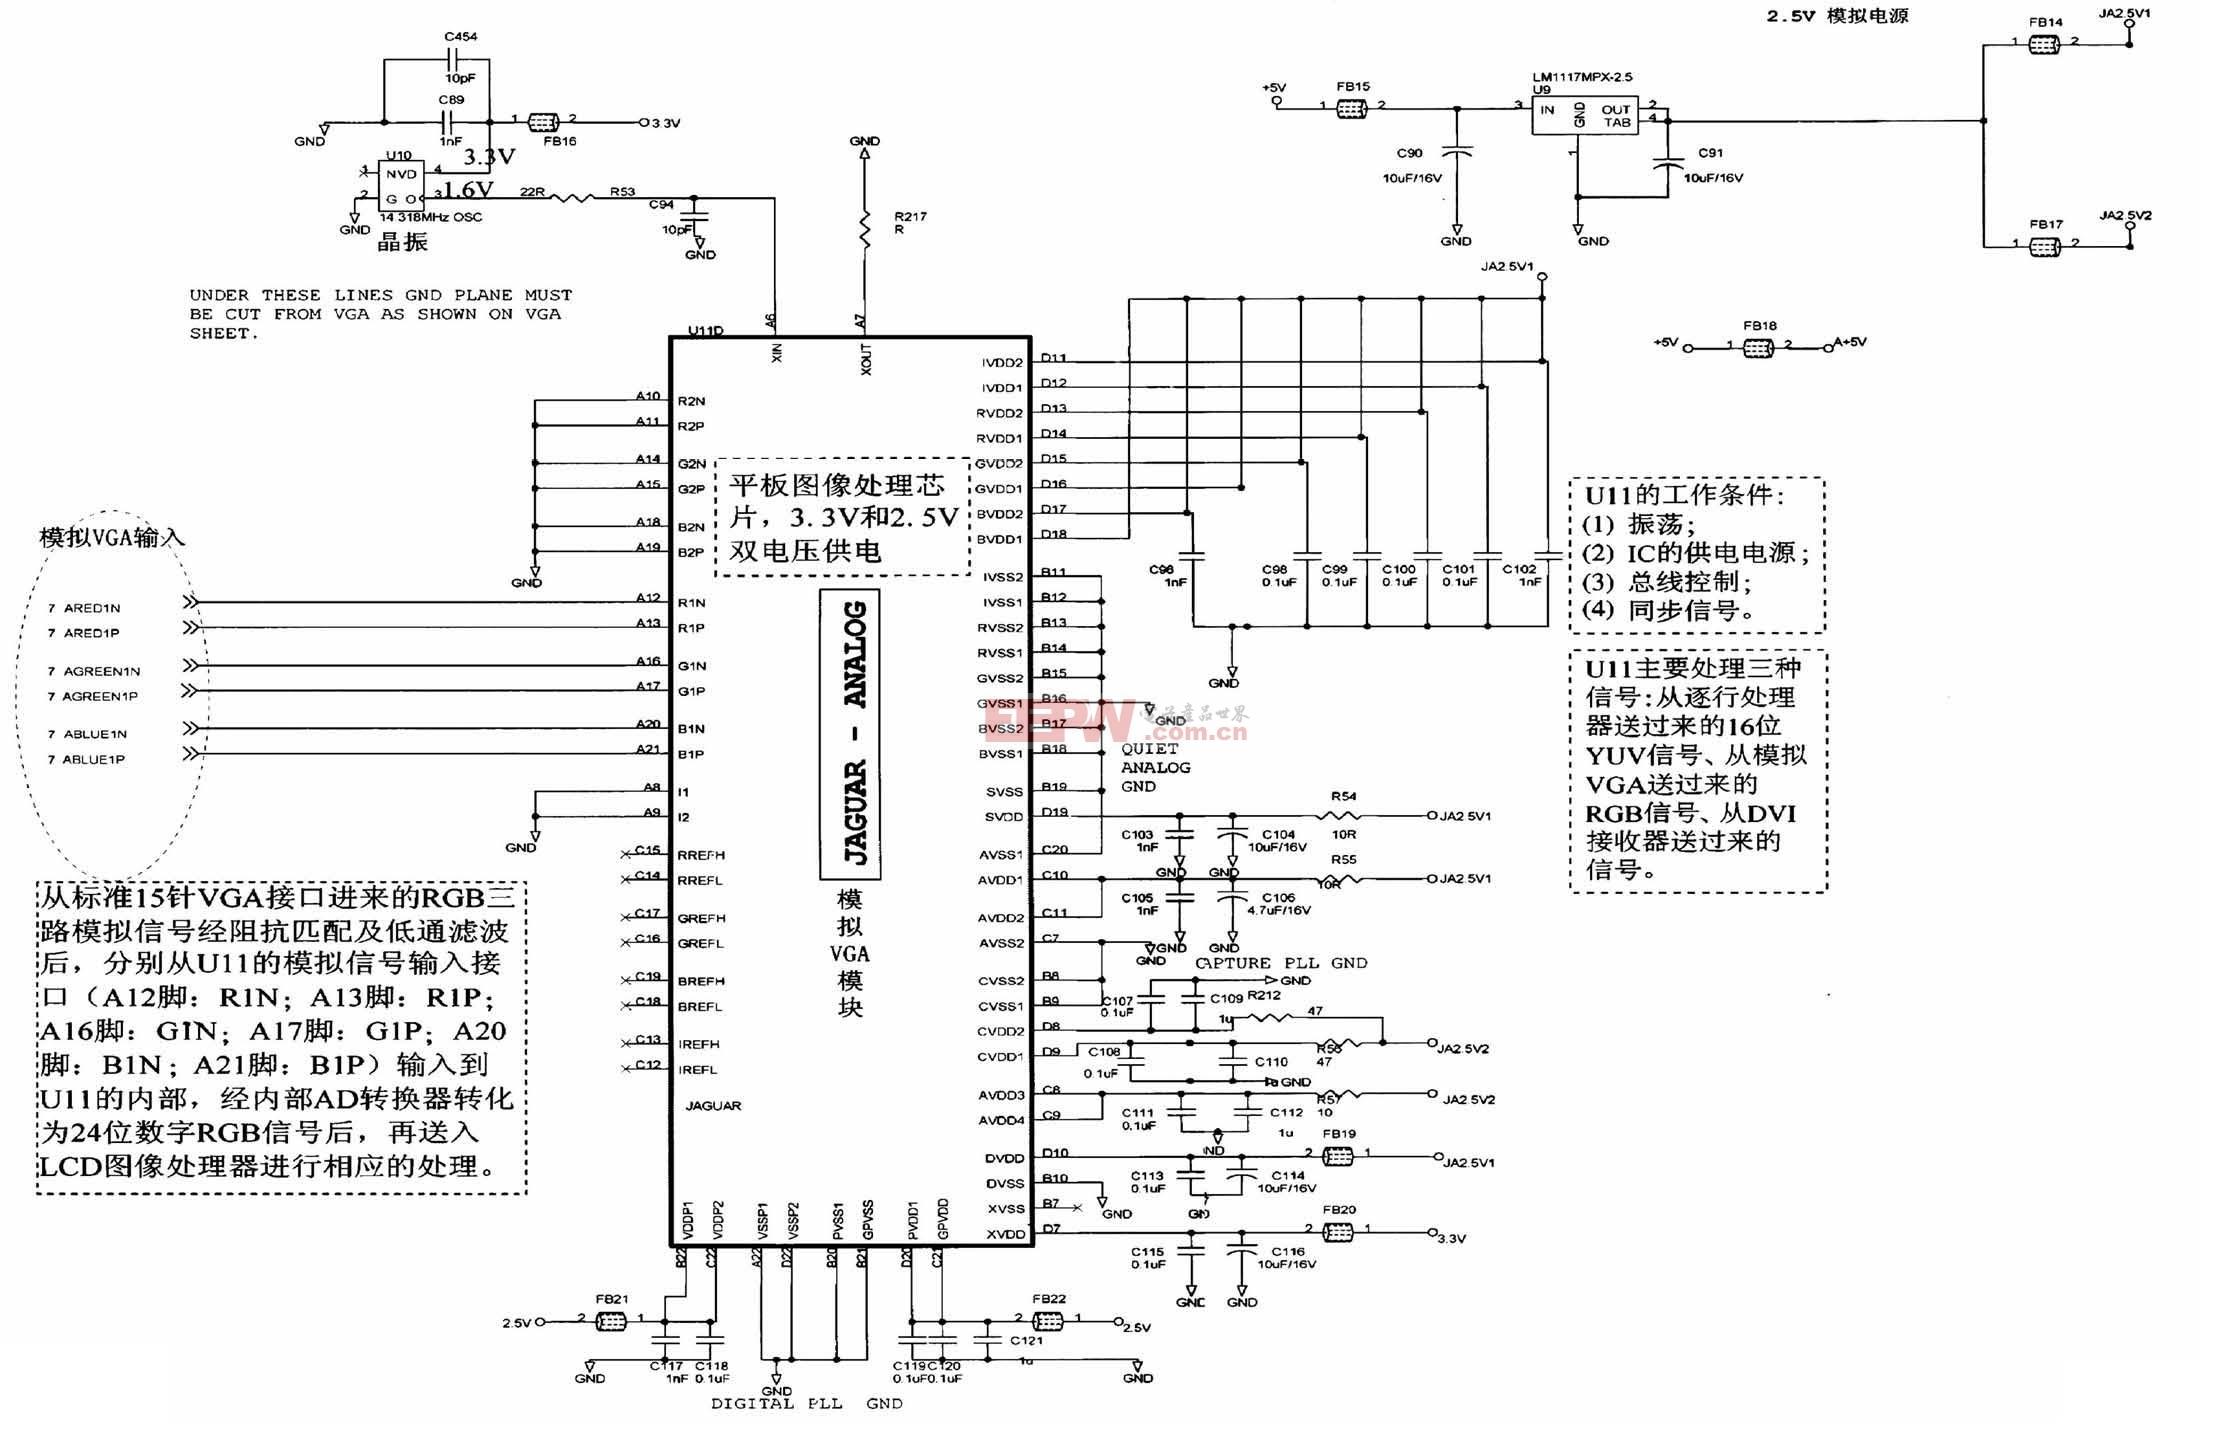 TCL王牌液晶彩电(26H机芯)数字板电路原理图